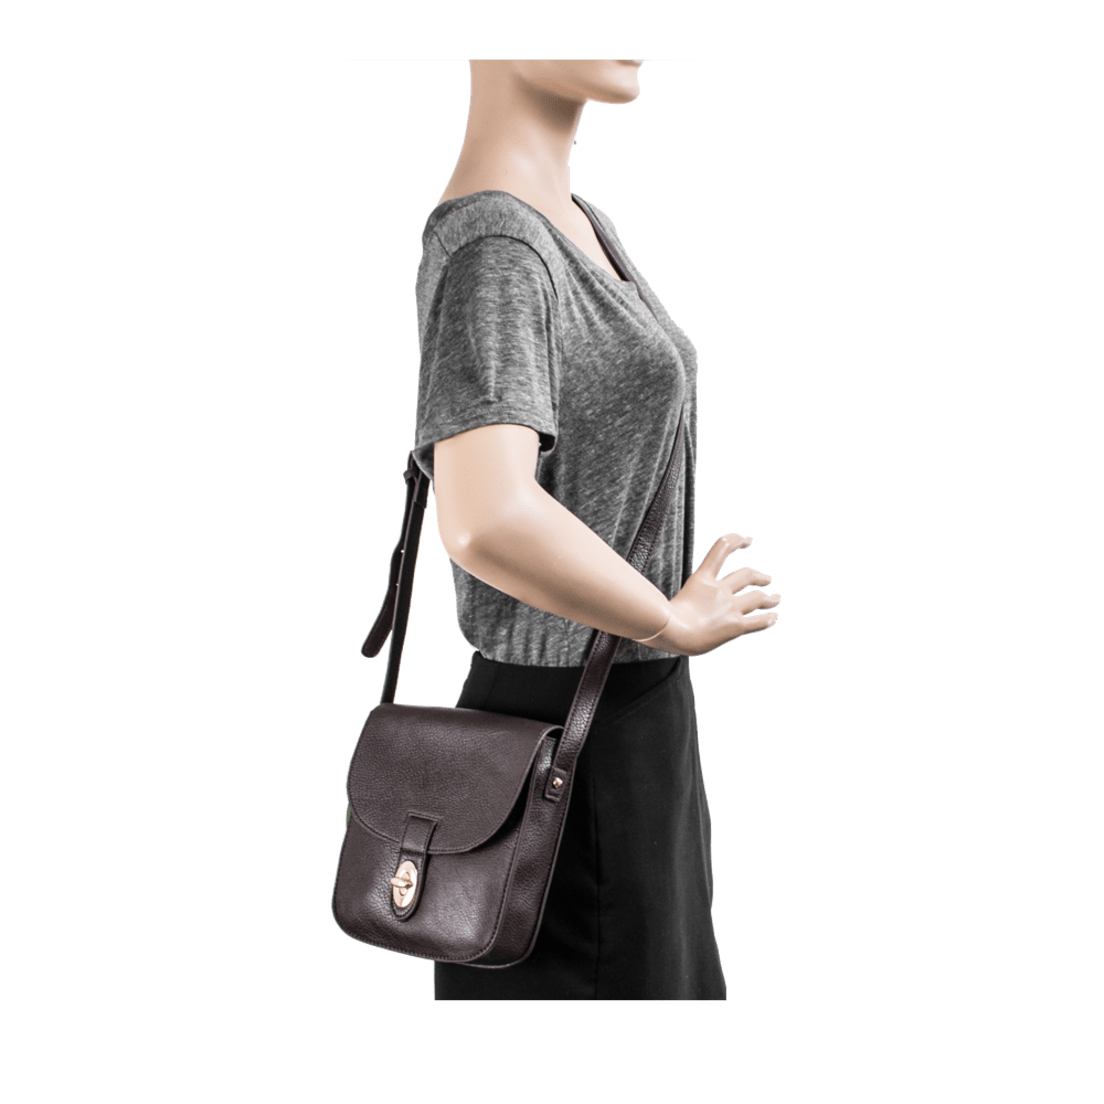 Crossbody Bag by Parinda (OLD) 0ce7f8022e20f